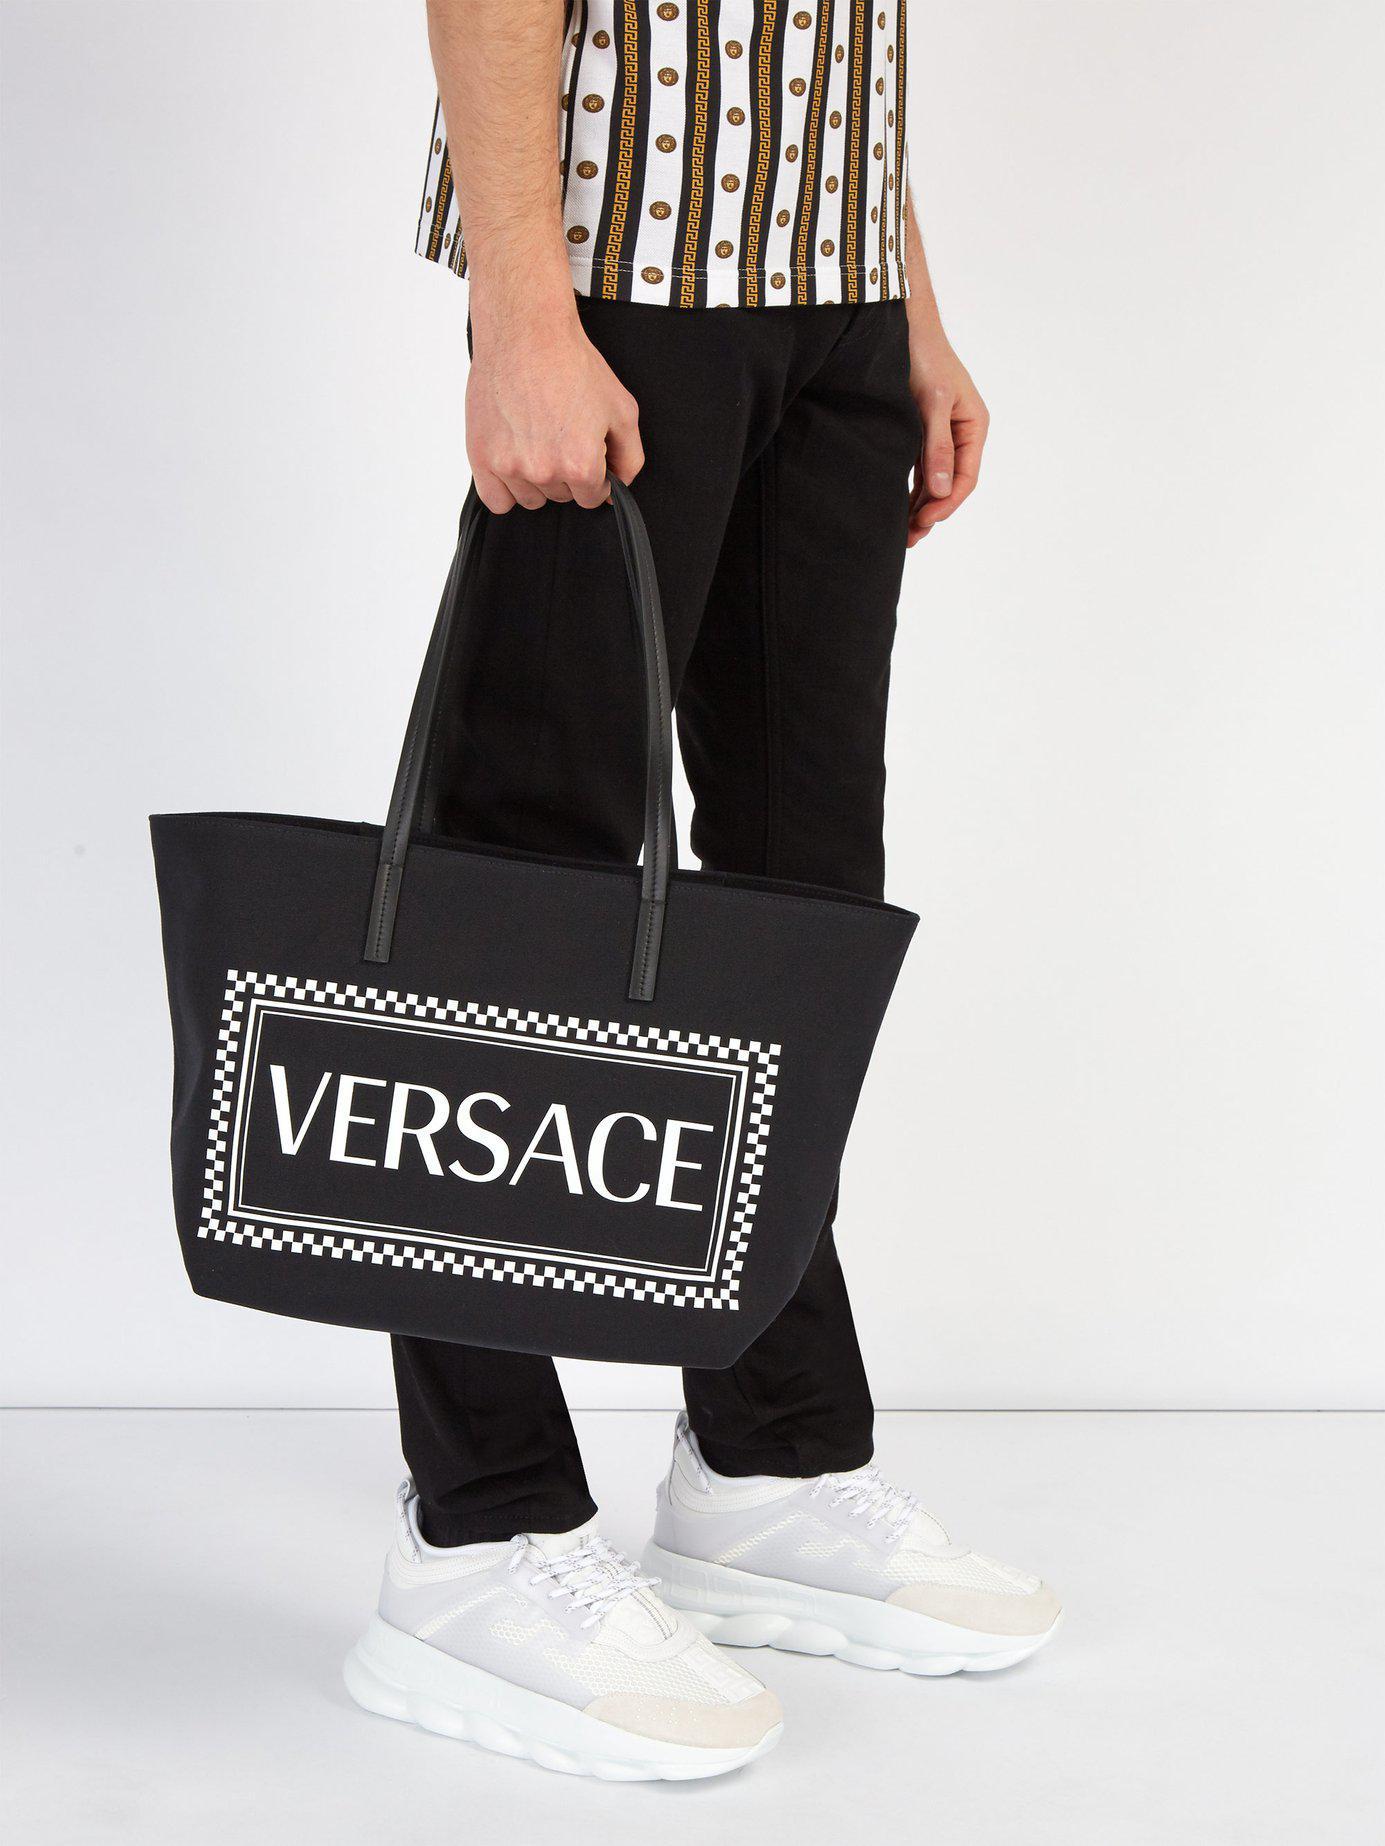 6c0596a0fb23 Versace - Black Logo Print Canvas Tote for Men - Lyst. View fullscreen